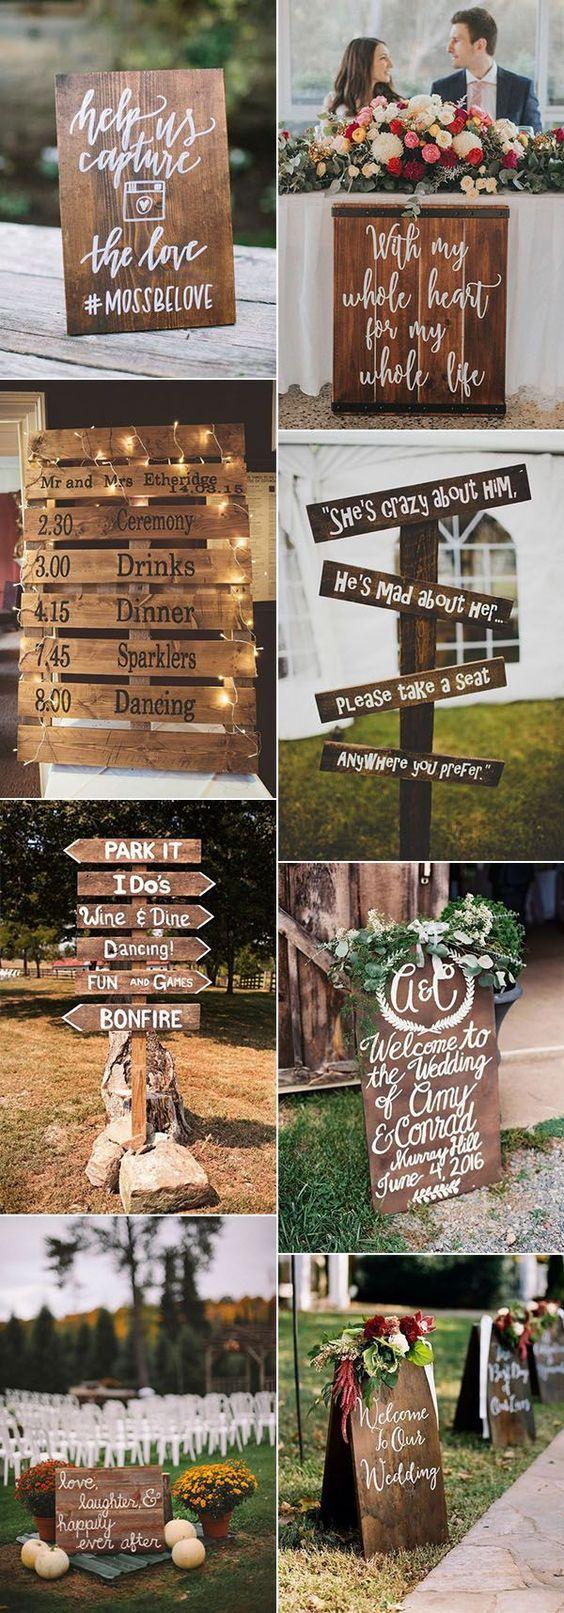 Simple wedding decoration designs   best I love a good wedding images on Pinterest  Wedding ideas